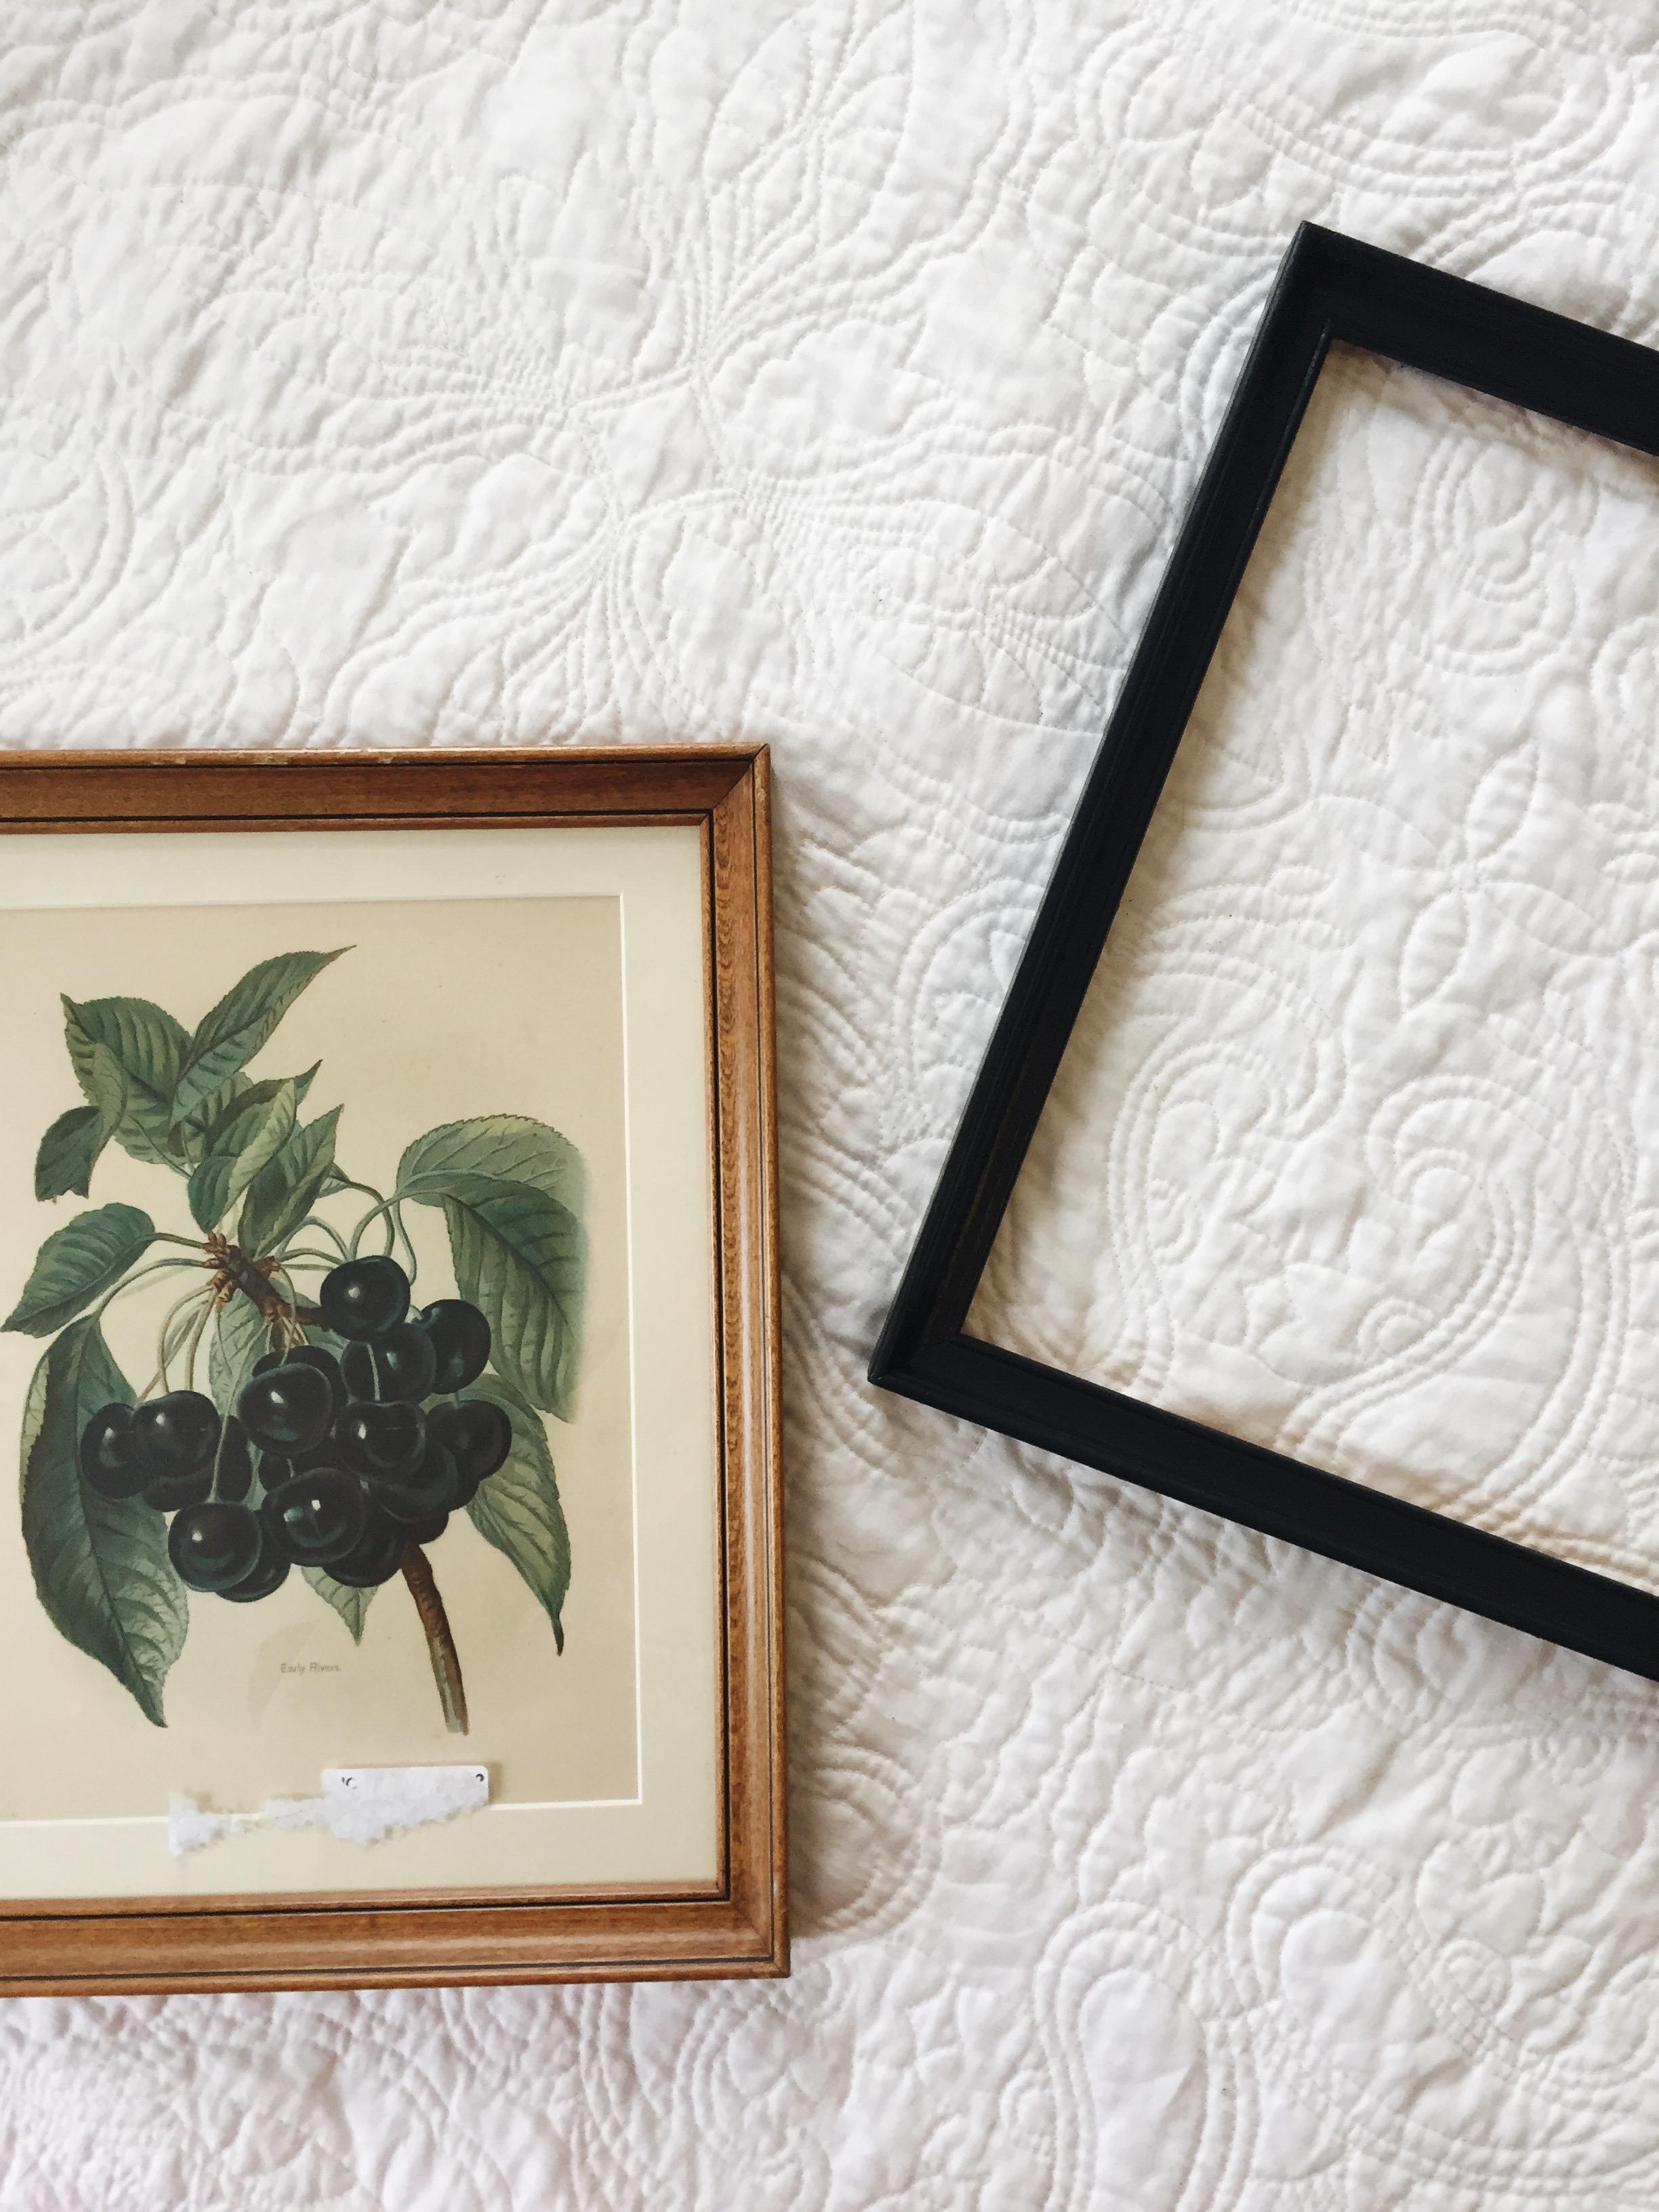 botanical_print_Charleston_south_carolina_exposed_fireplace_historic_home_bedroom_renovation_fireplace_mantle.JPG